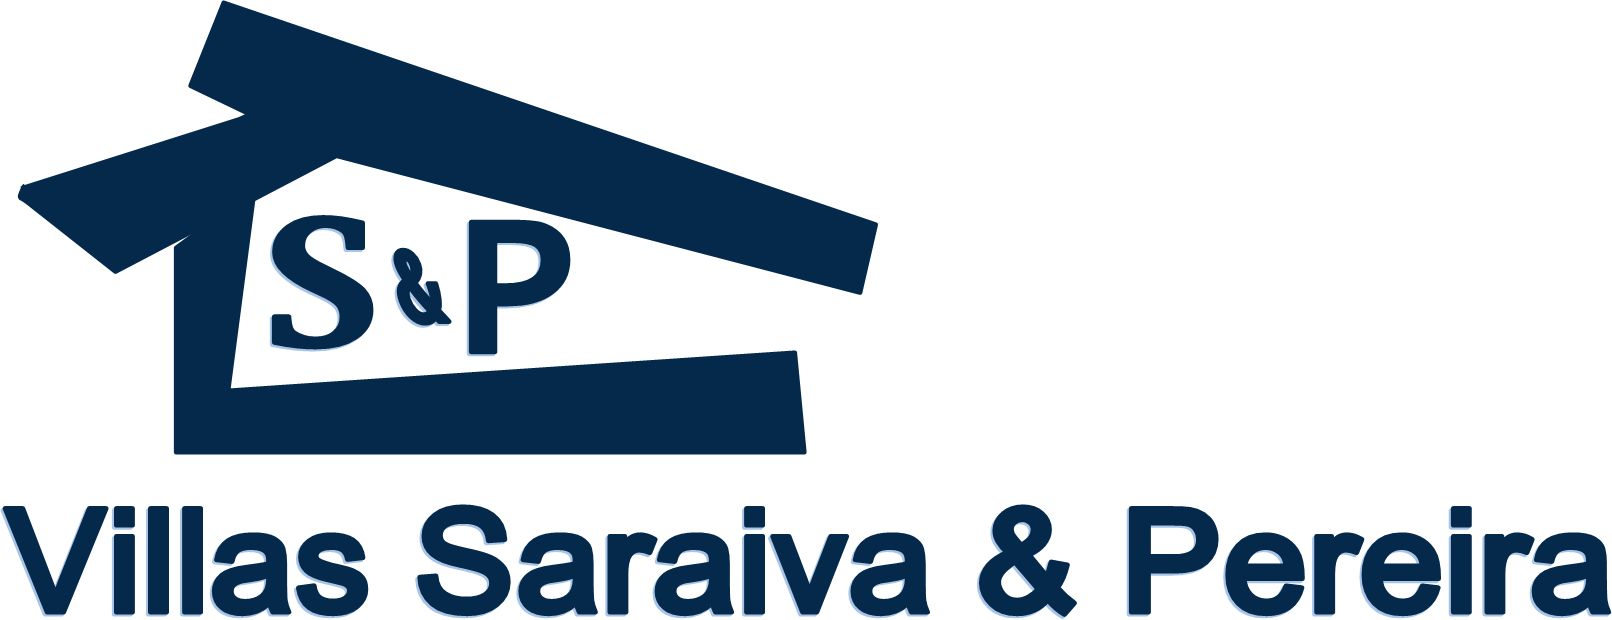 Villas Saraiva & Pereira - Mediaçao Imobiliaria, Lda.